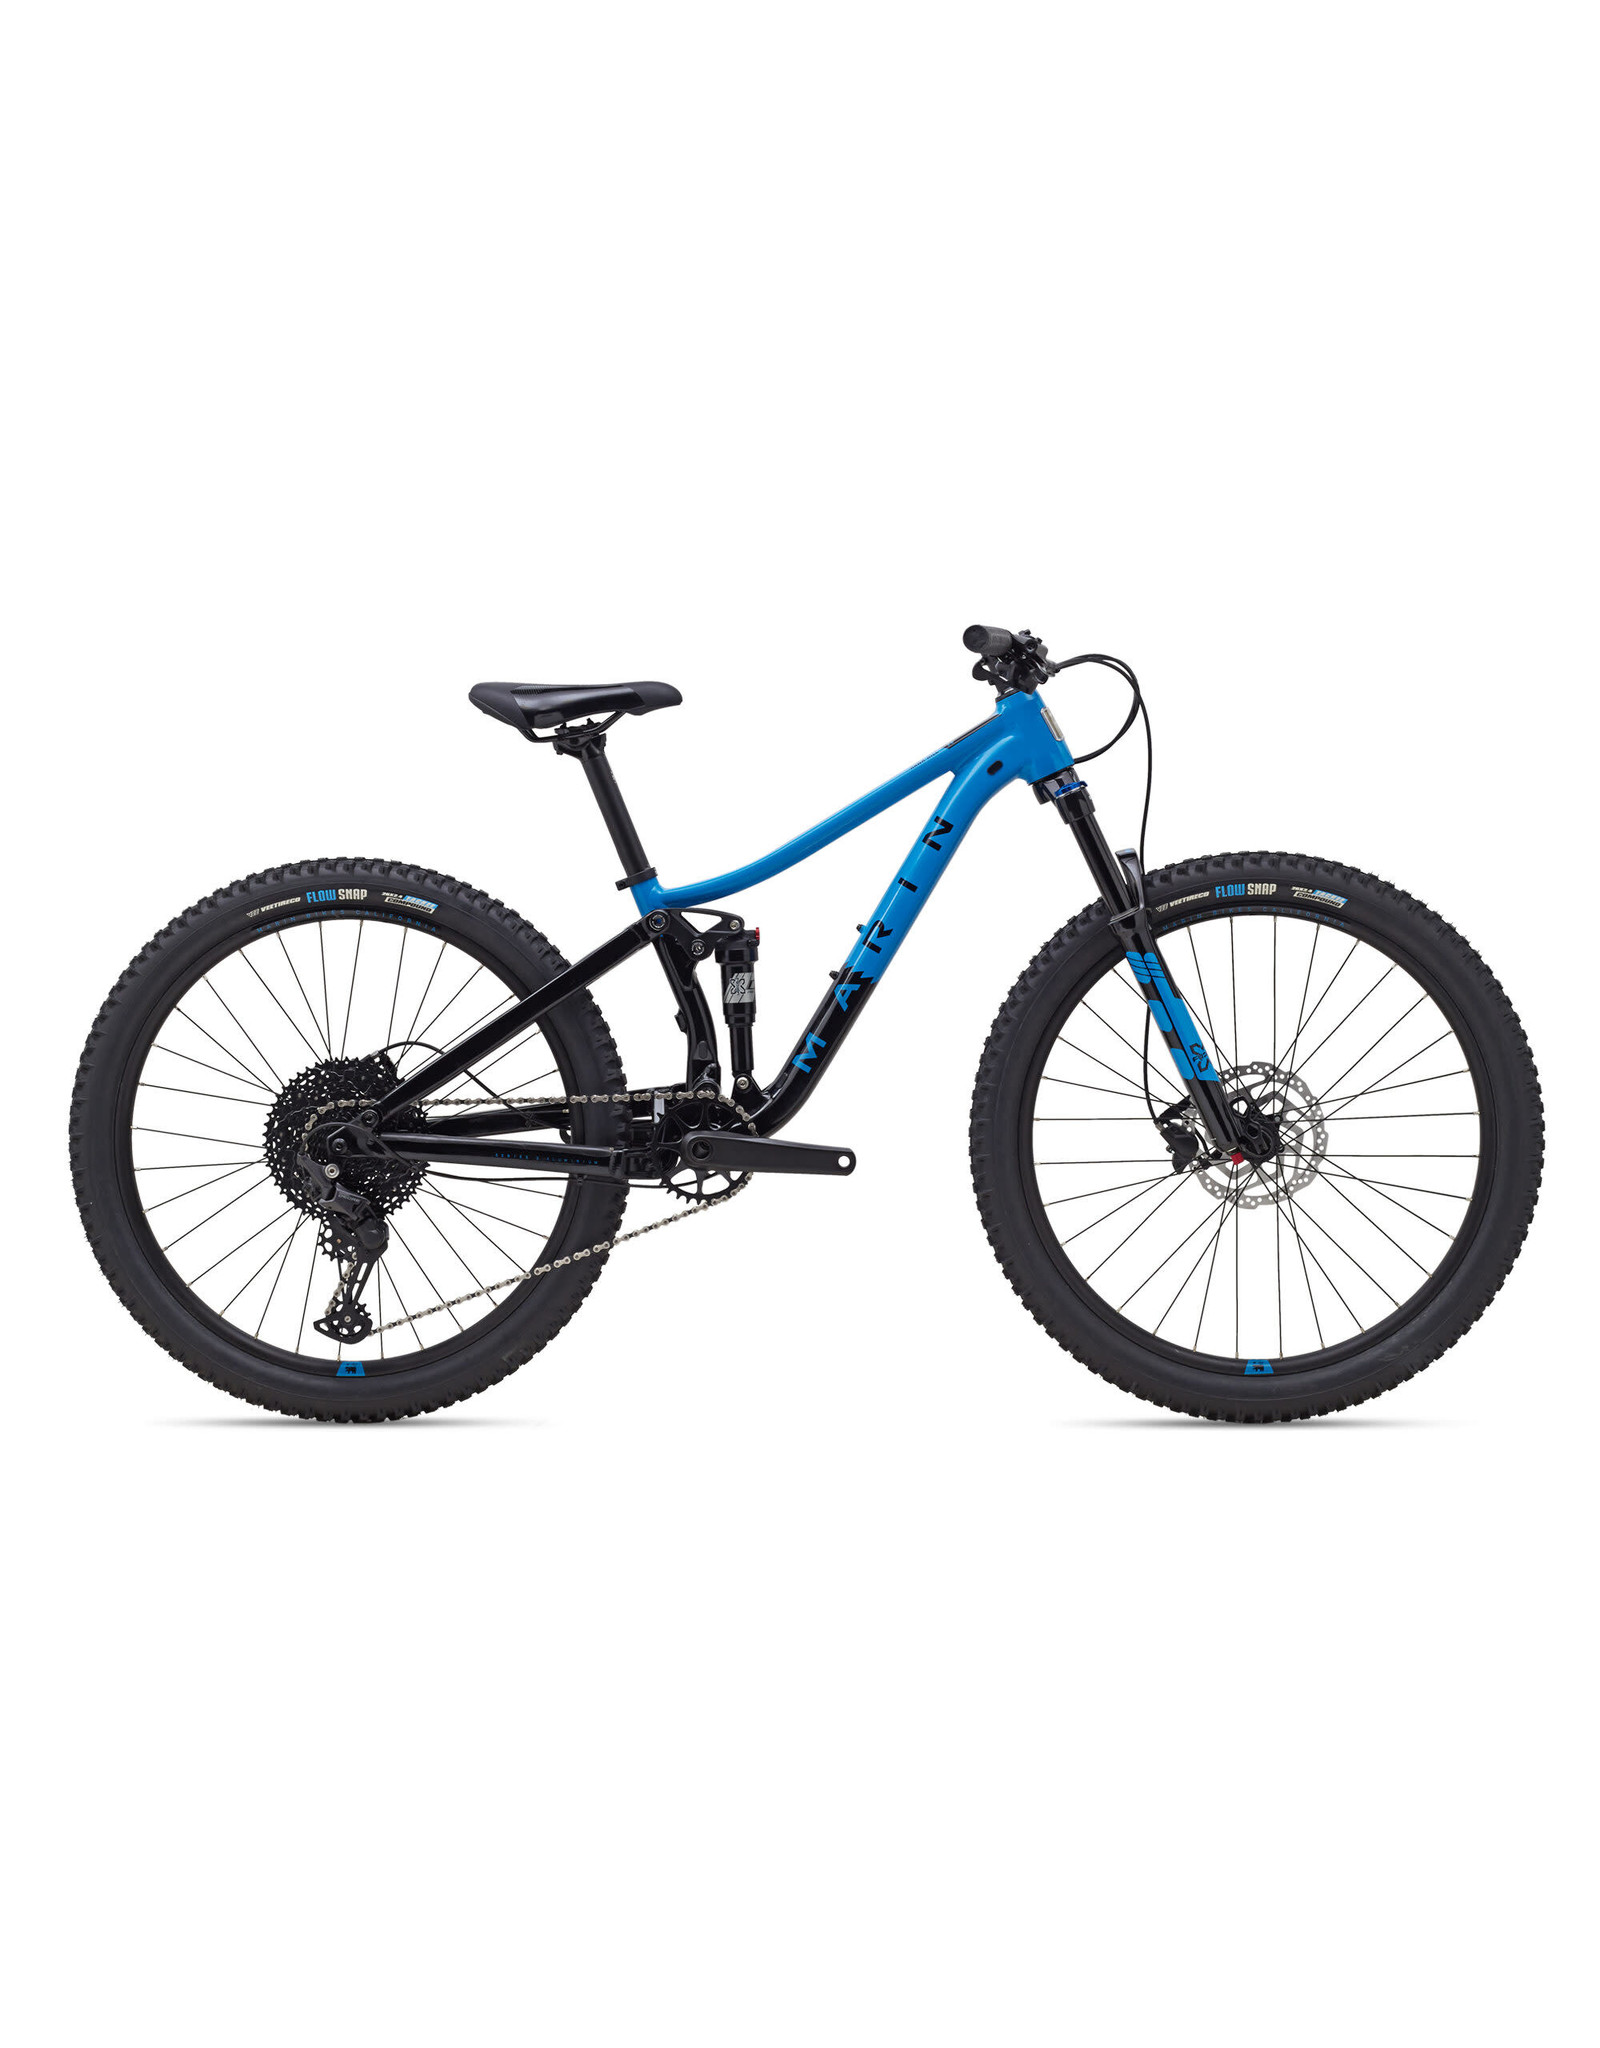 "Marin Bikes 2021 Marin Rift Zone Jr. 24"" Black/Blue"